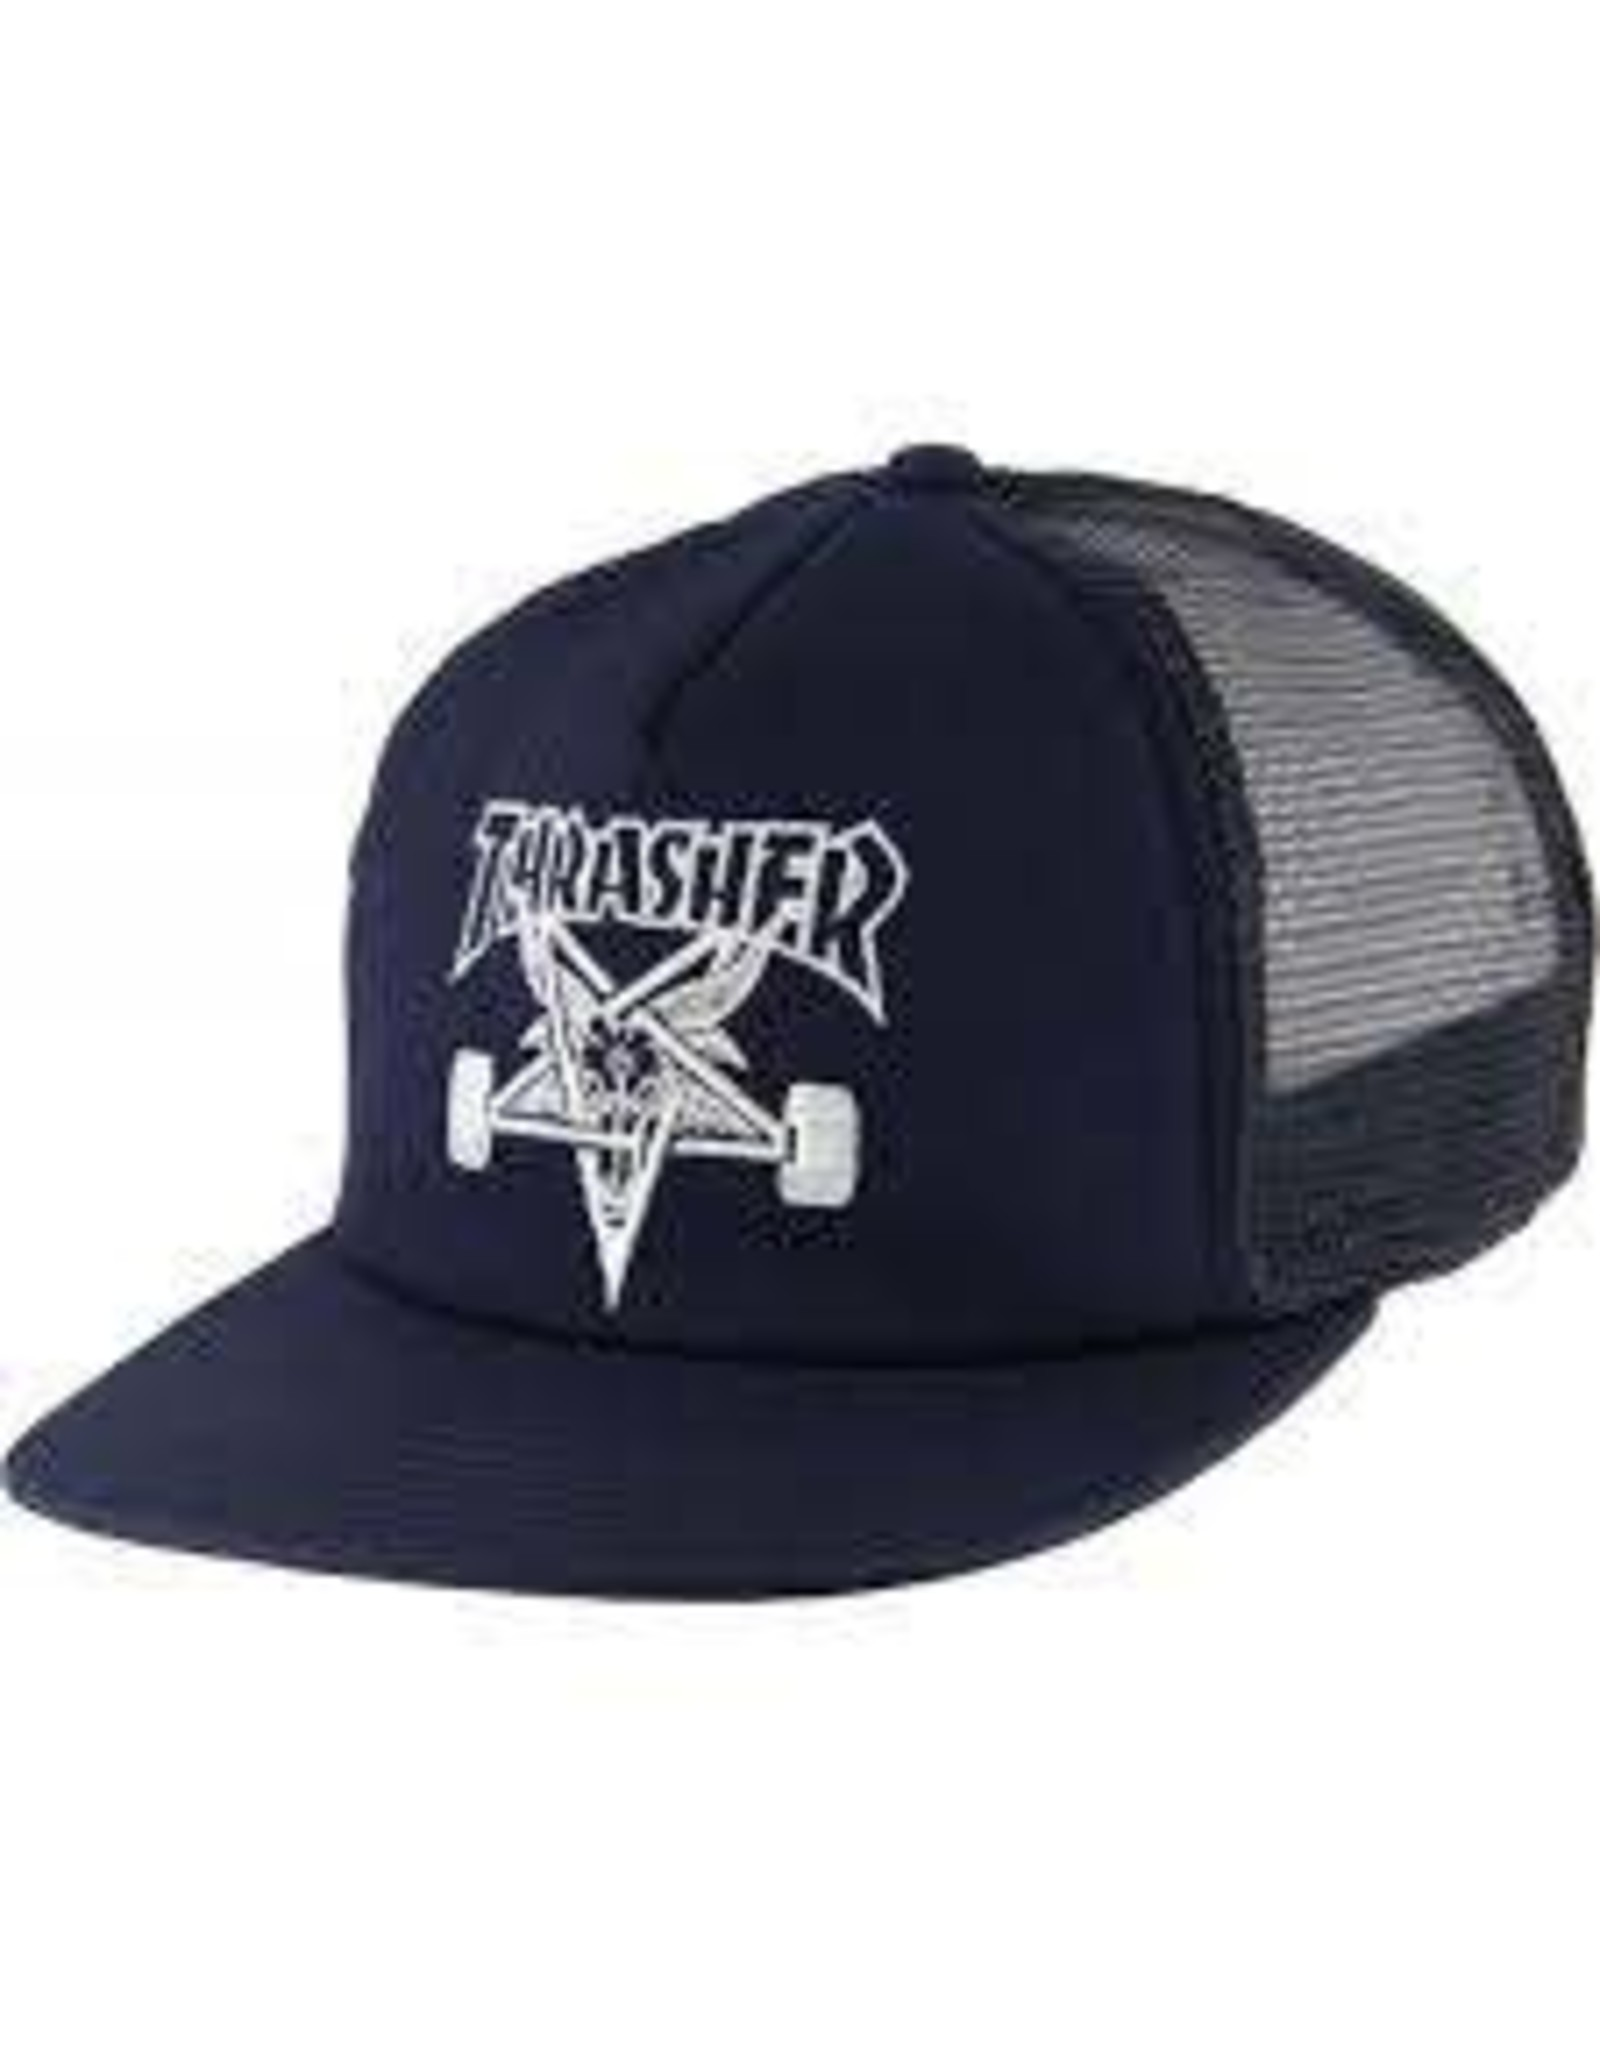 Trasher Trasher Skate Goat Cap Navy